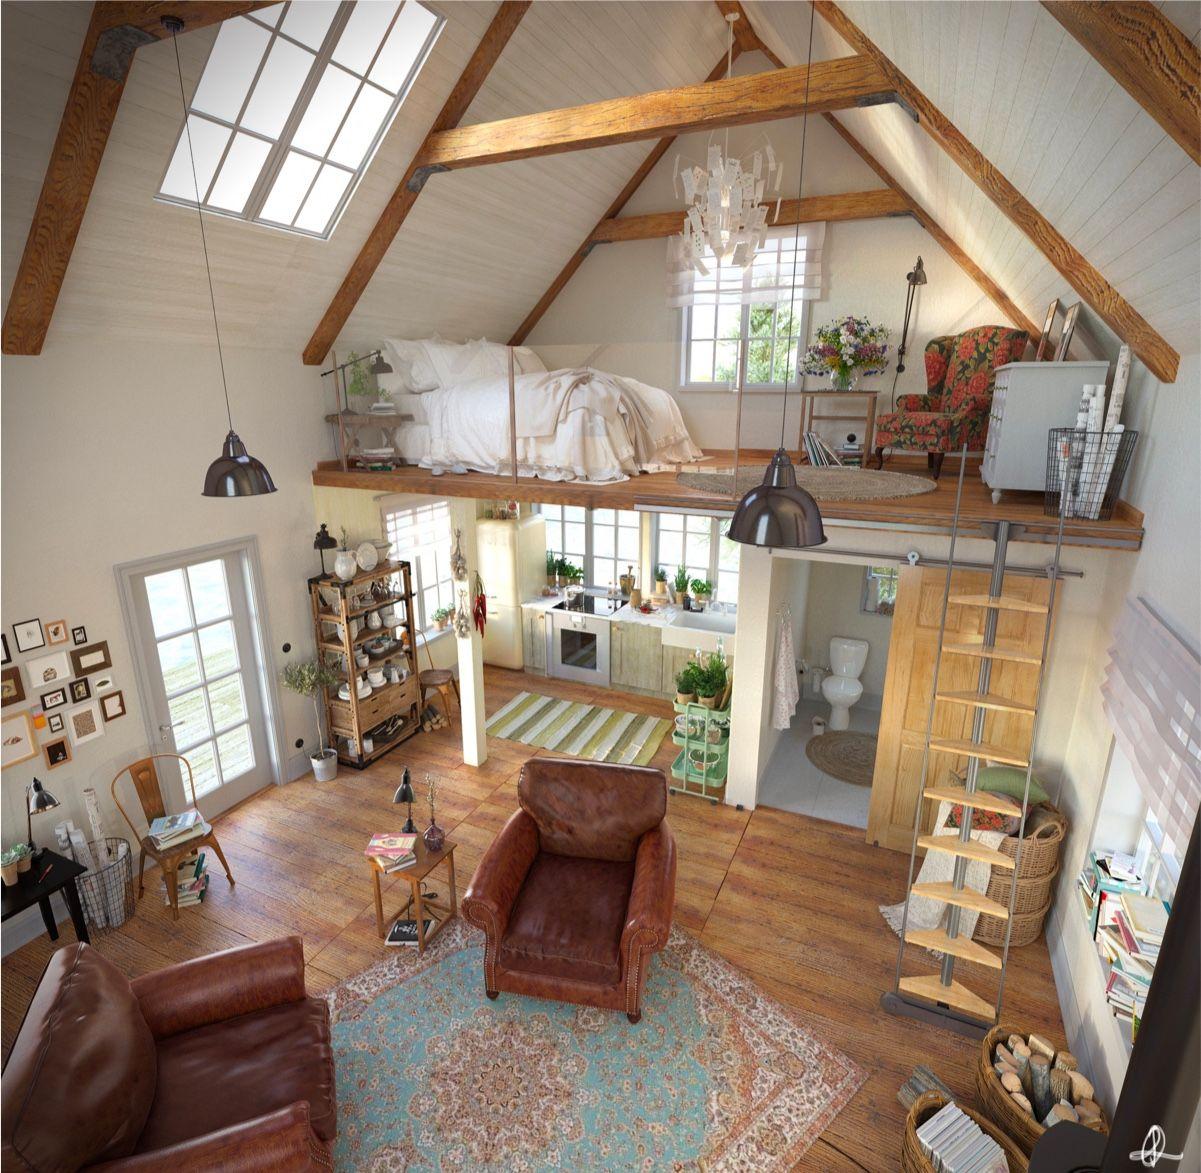 Best Kitchen Gallery: 40 Loft Living Spaces That Will Blow Your Mind Contemporary Lofts of Efficient Home Loft Design on rachelxblog.com